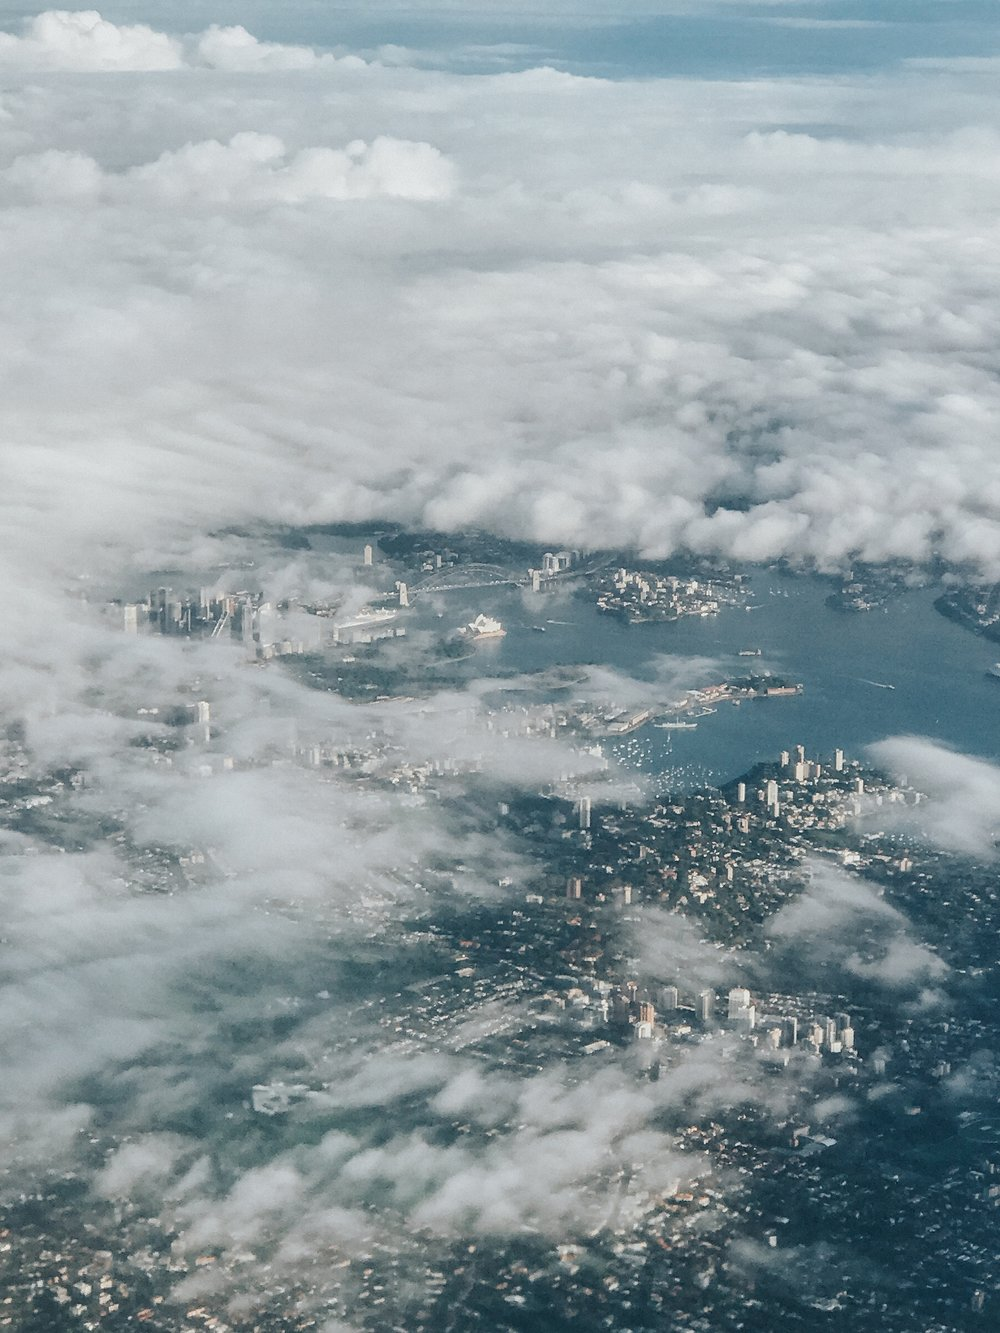 Sydney Harbor!